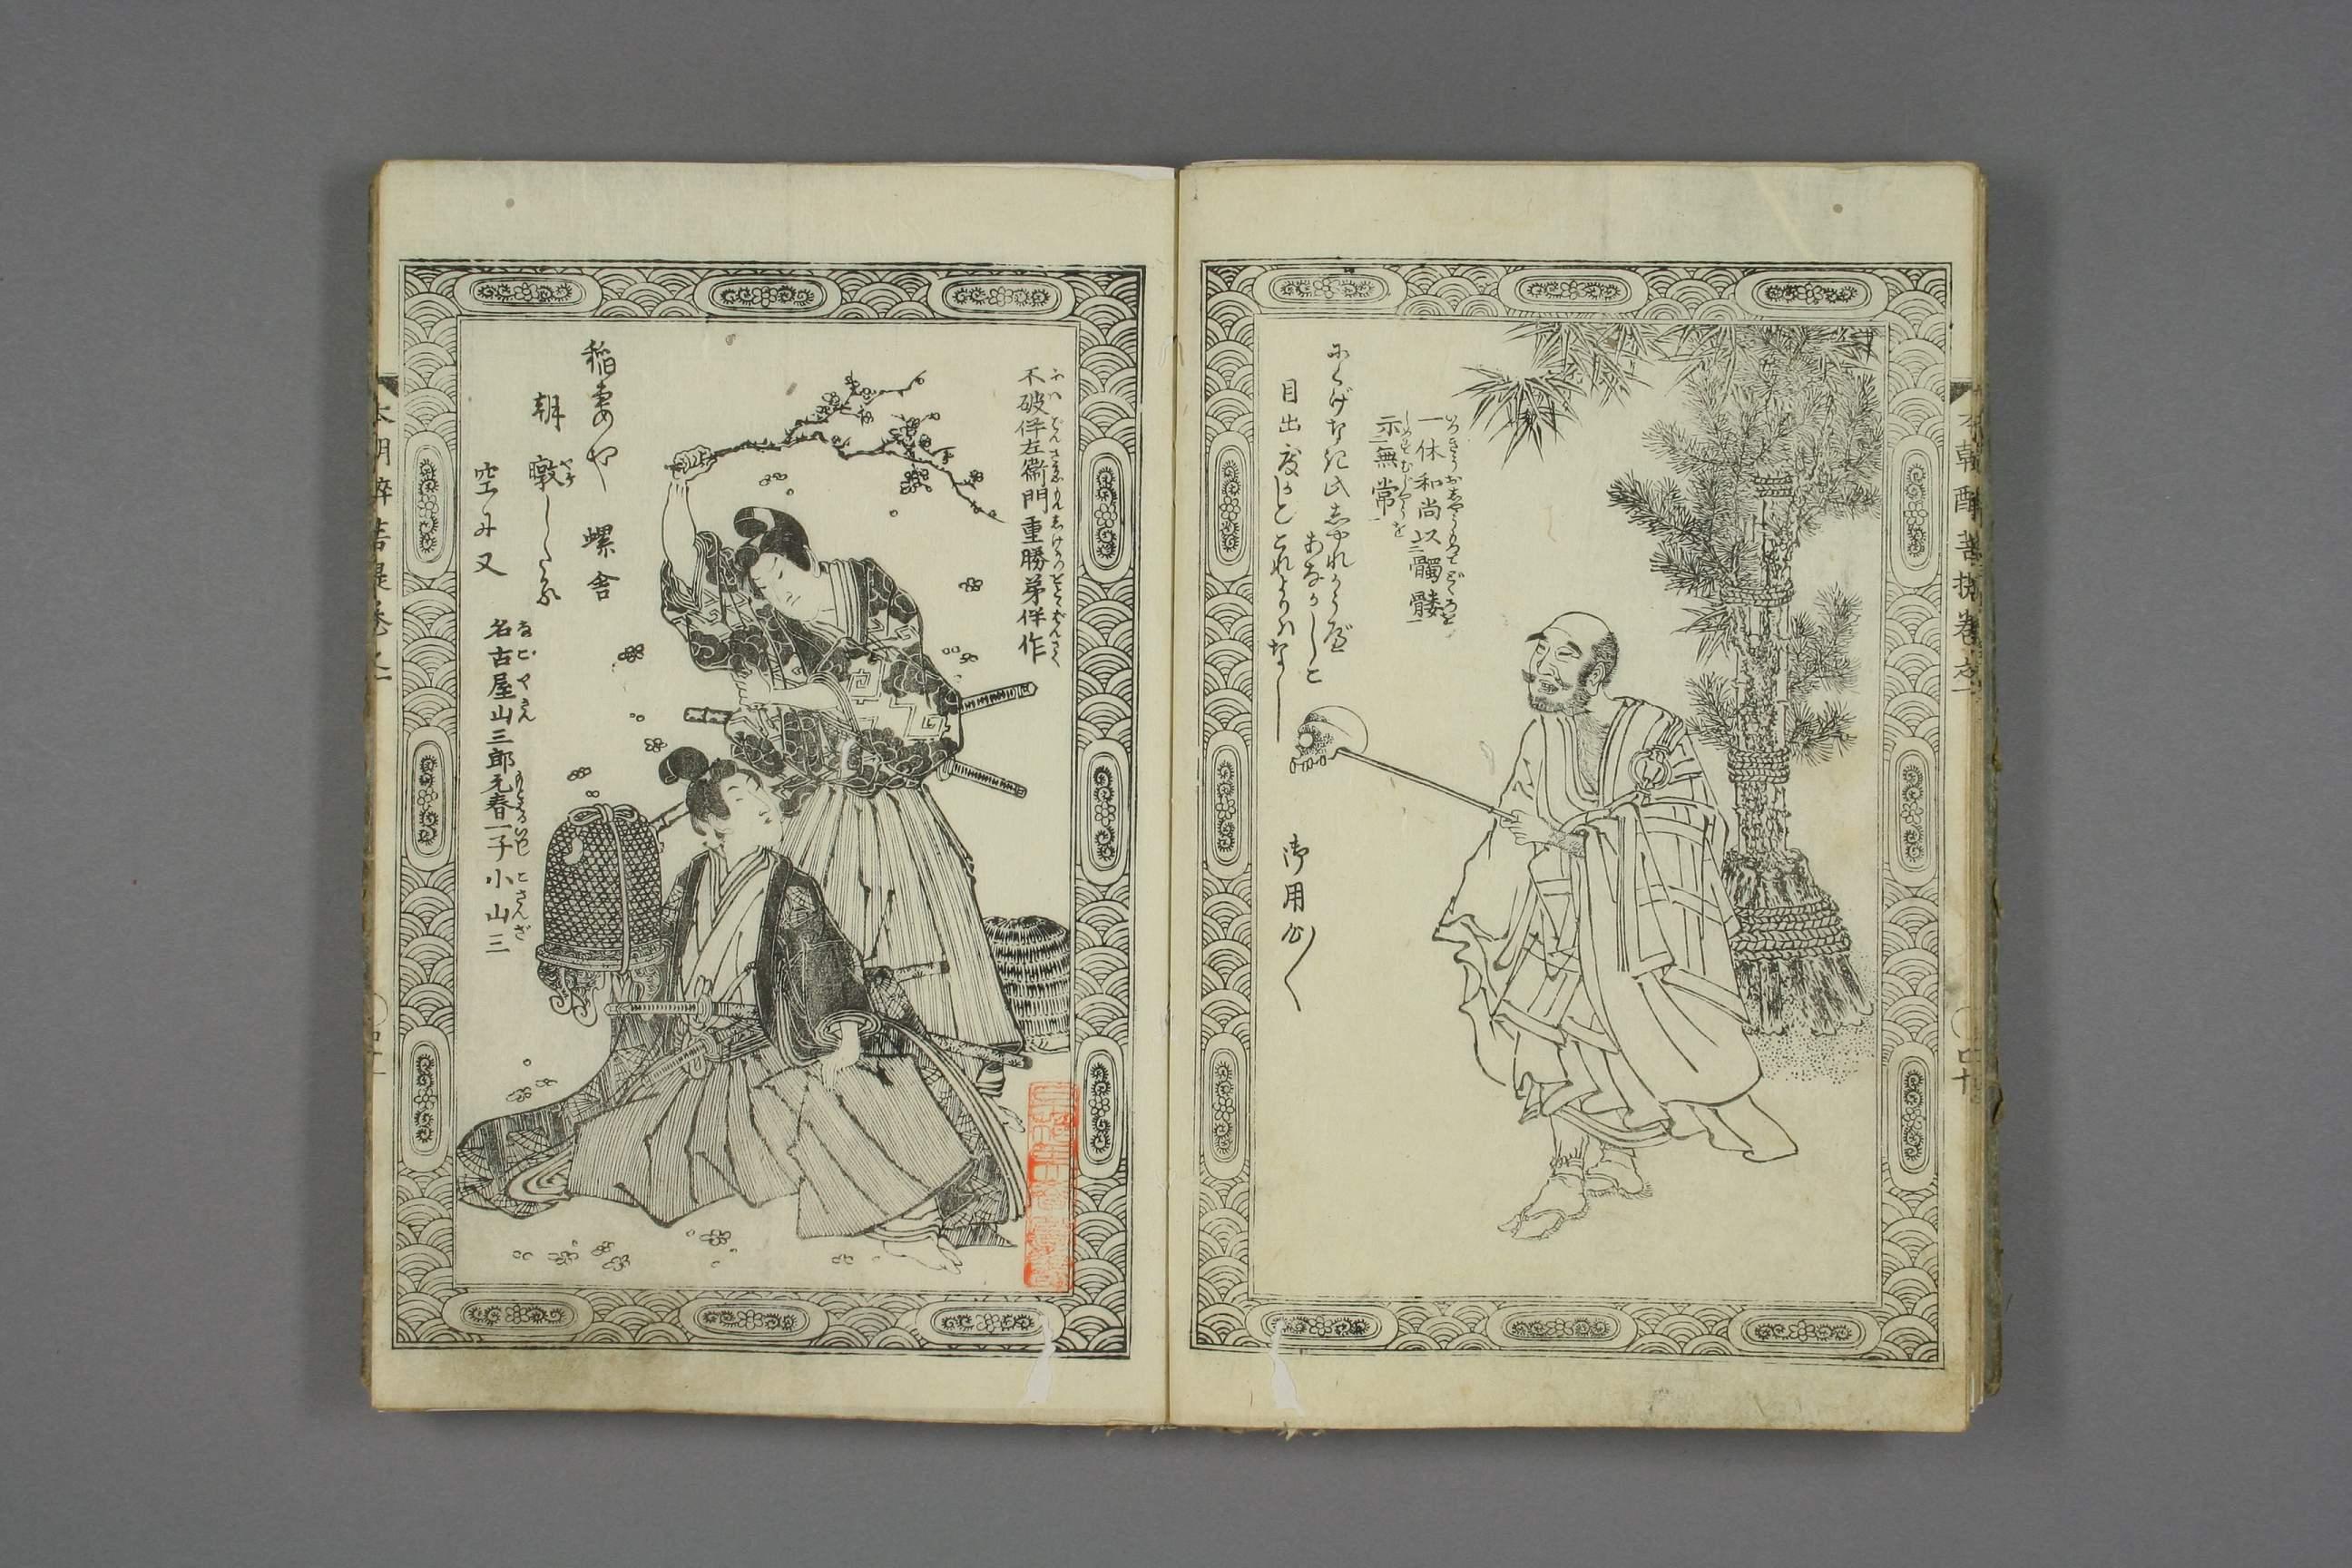 http://archive.wul.waseda.ac.jp/kosho/he13/he13_03047/he13_03047_0001/he13_03047_0001_p0012.jpg